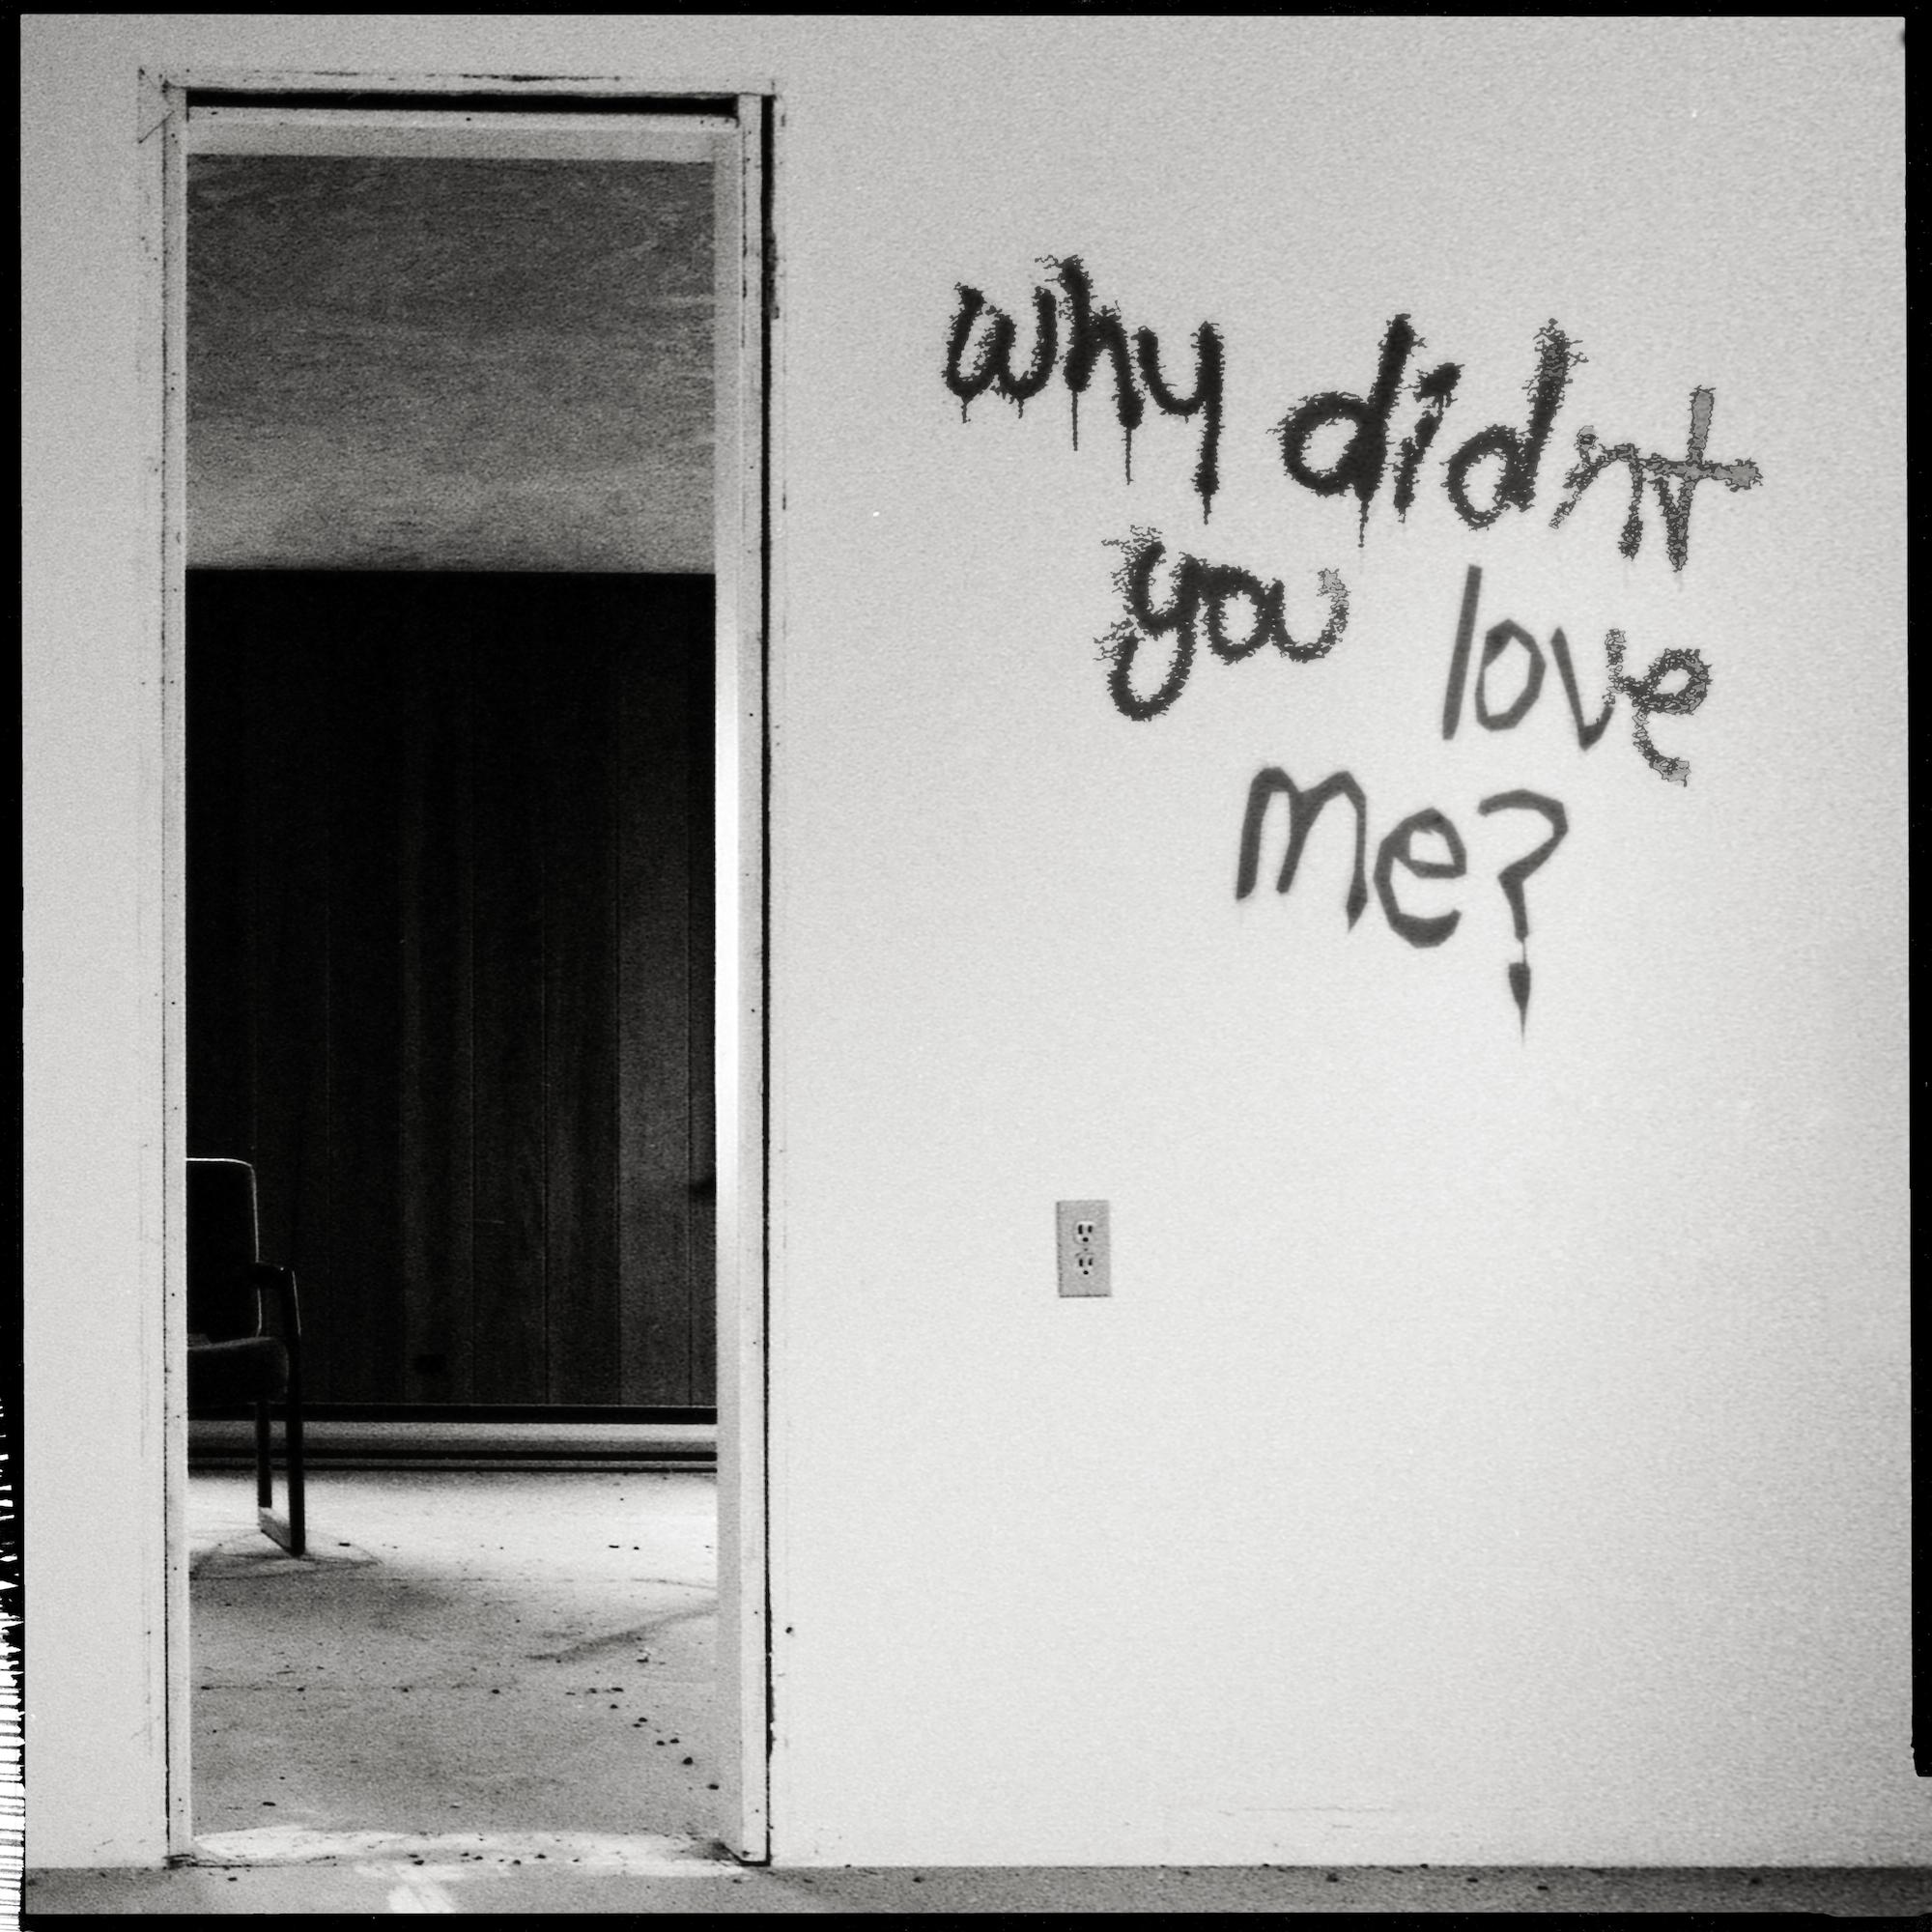 why didn't you love me | frank lassak | nikon f5 | agfa scala at 800 iso 2000 px